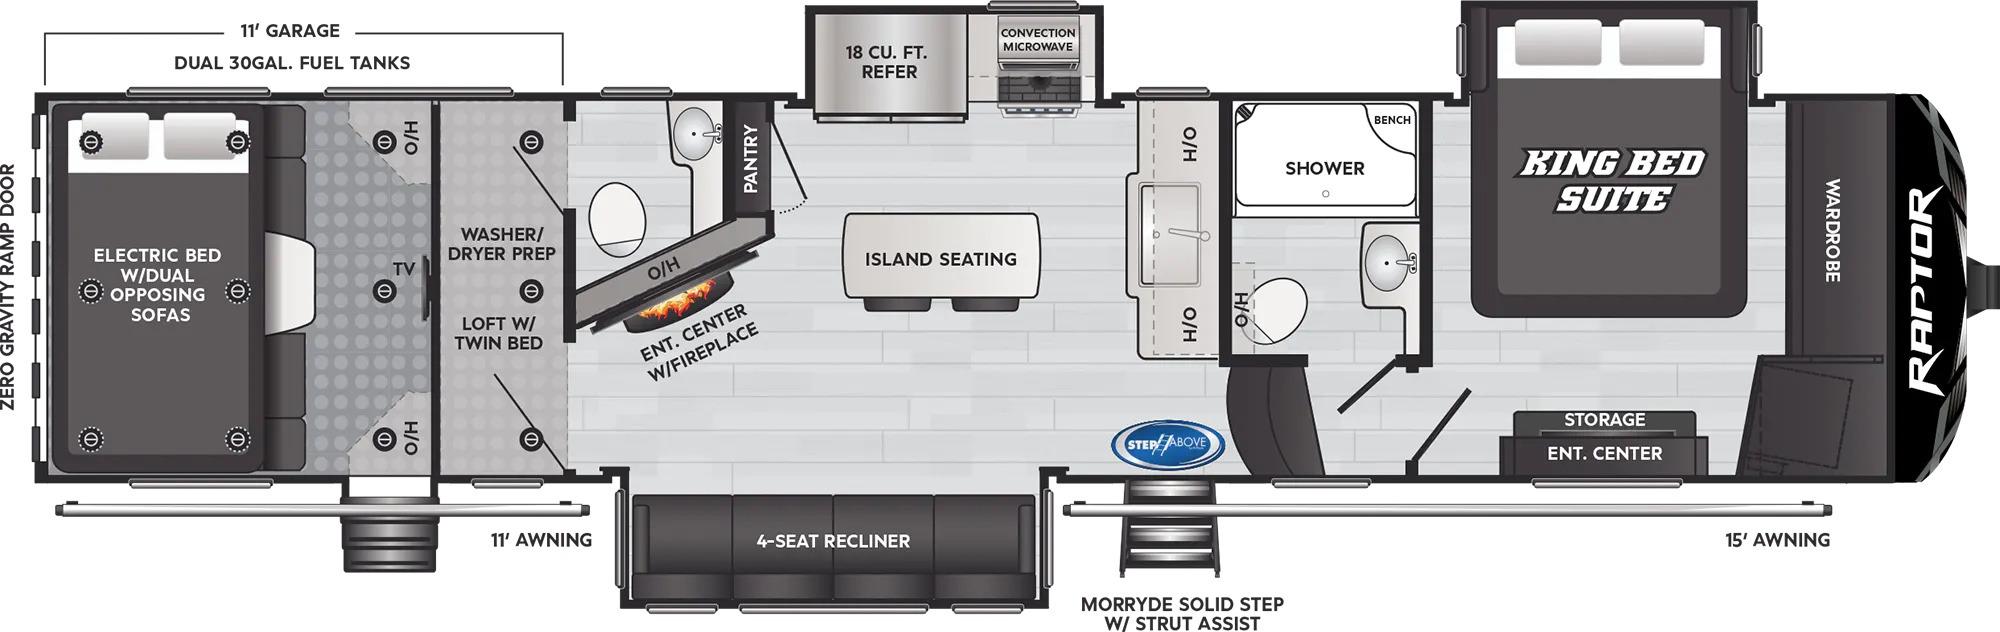 View Floor Plan for 2022 KEYSTONE RAPTOR 352